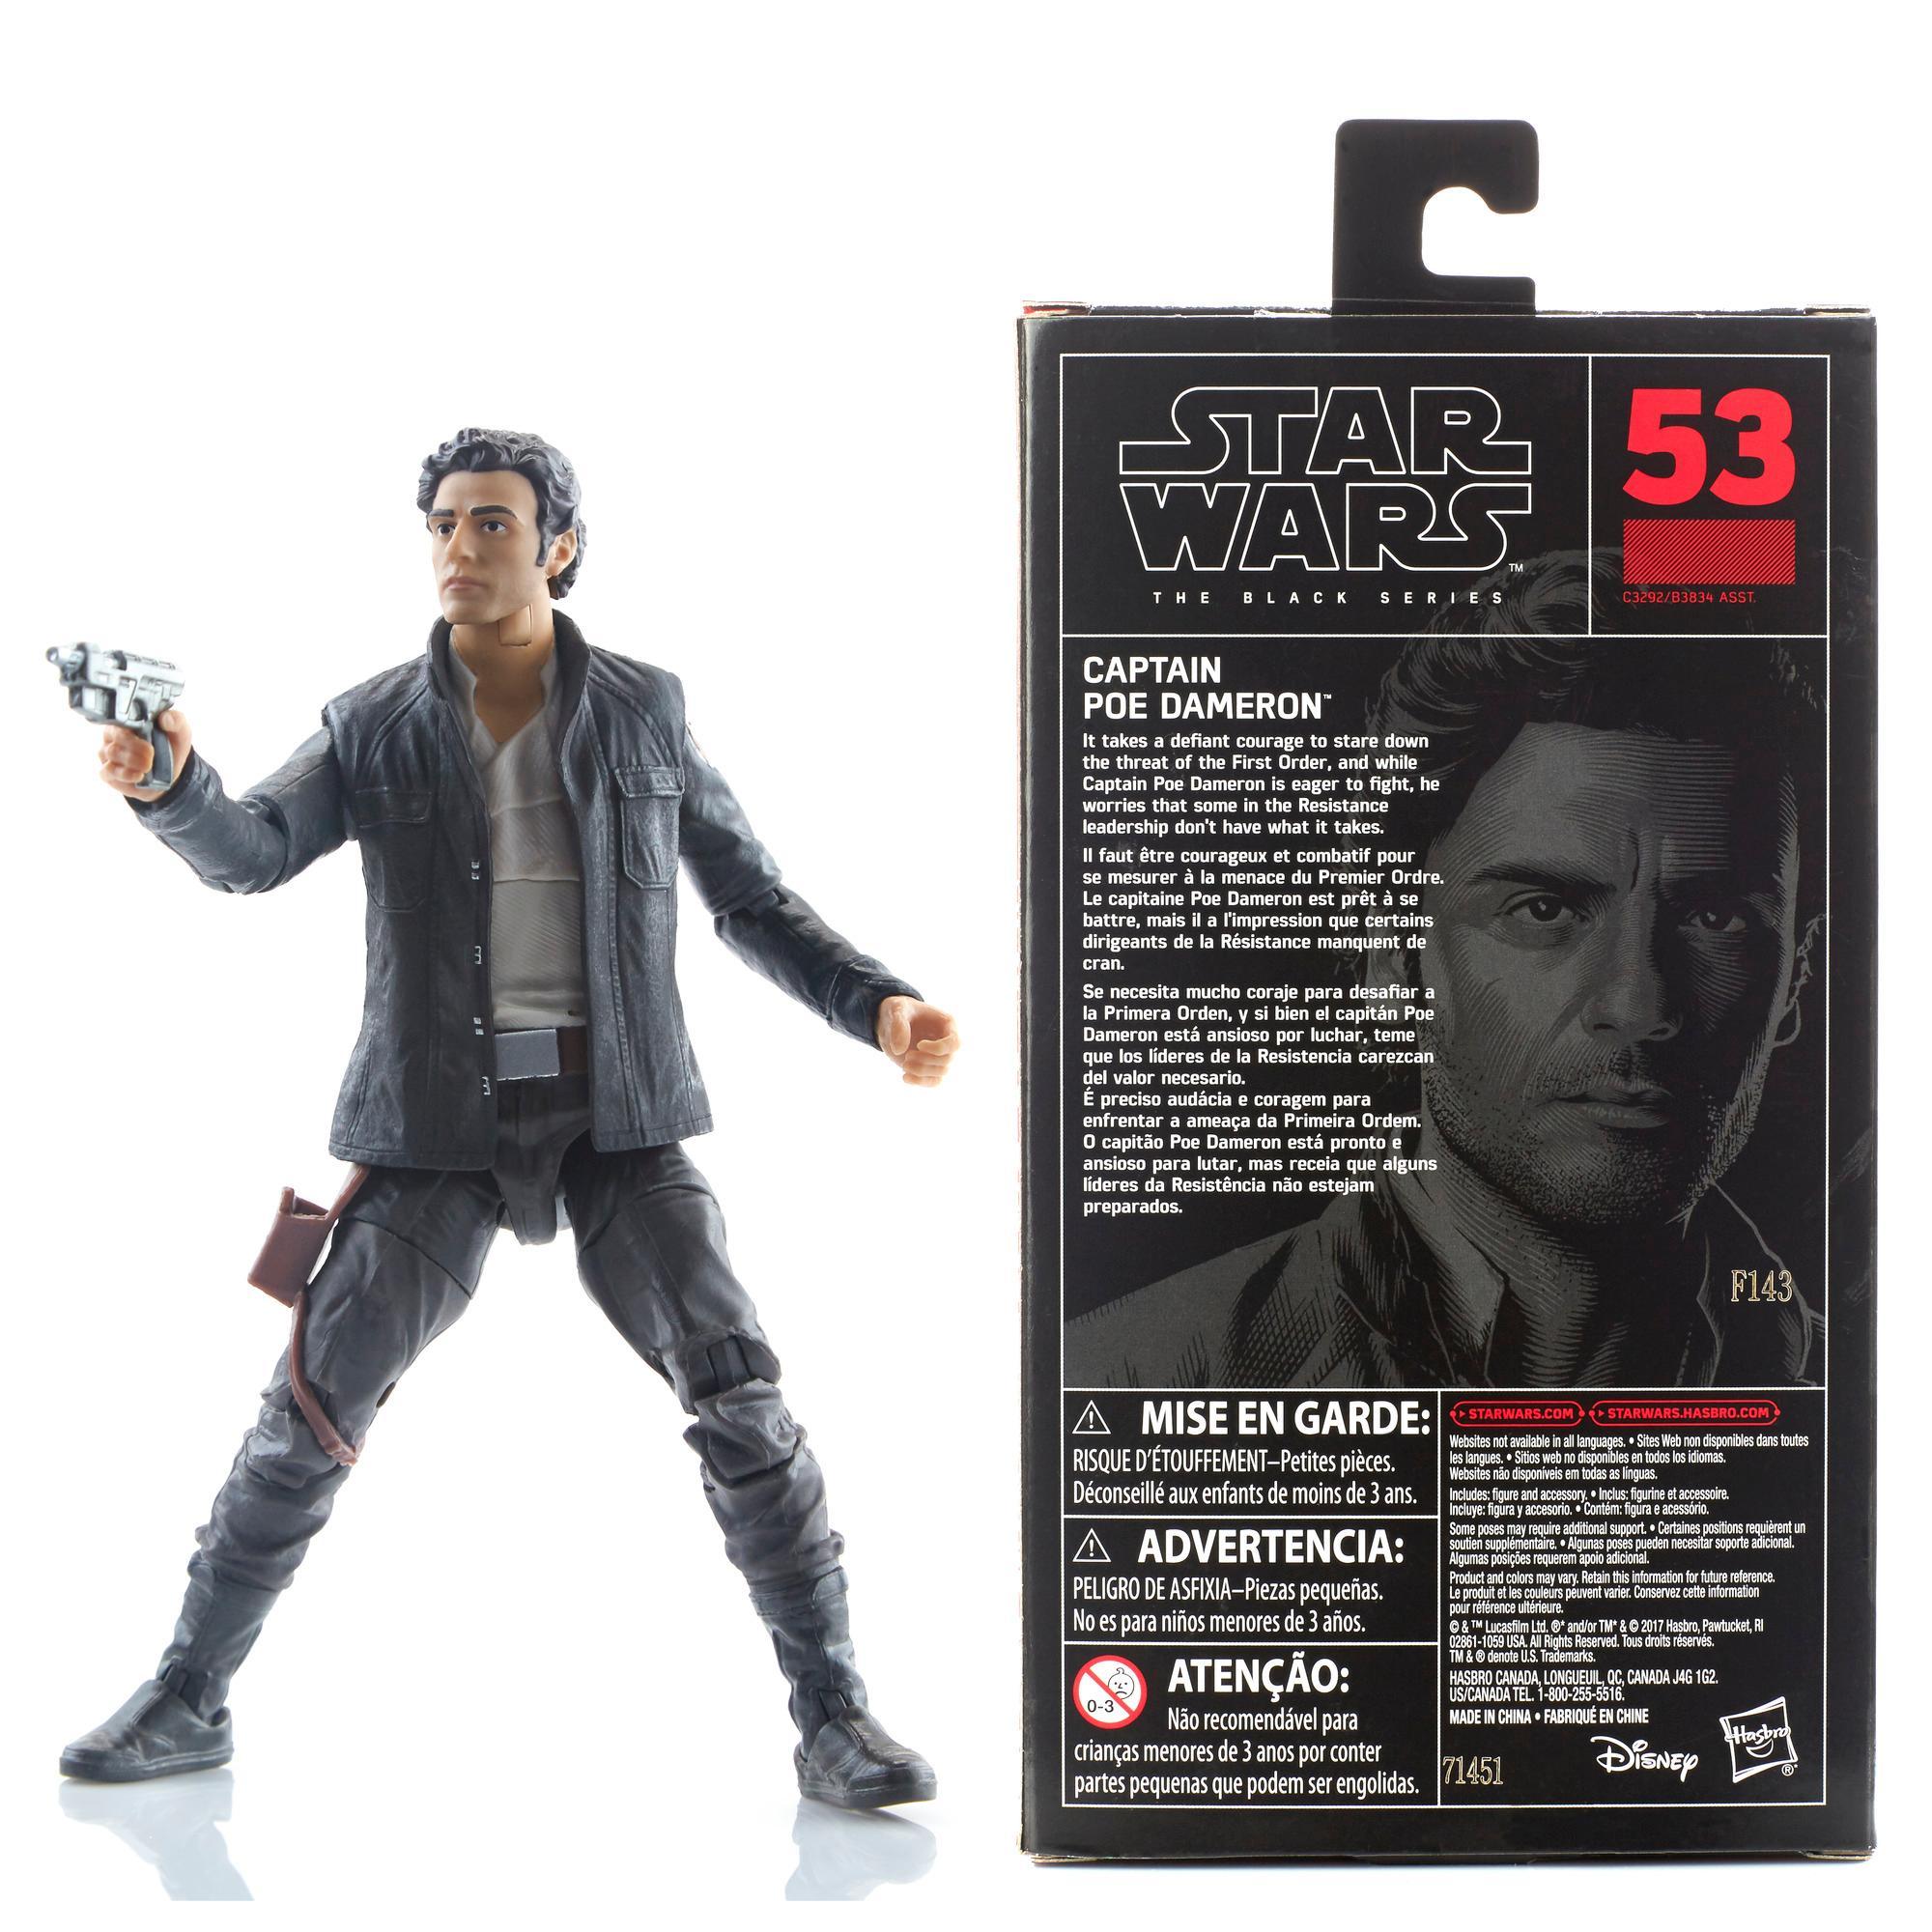 Star Wars The Black Series Capitão Poe Dameron